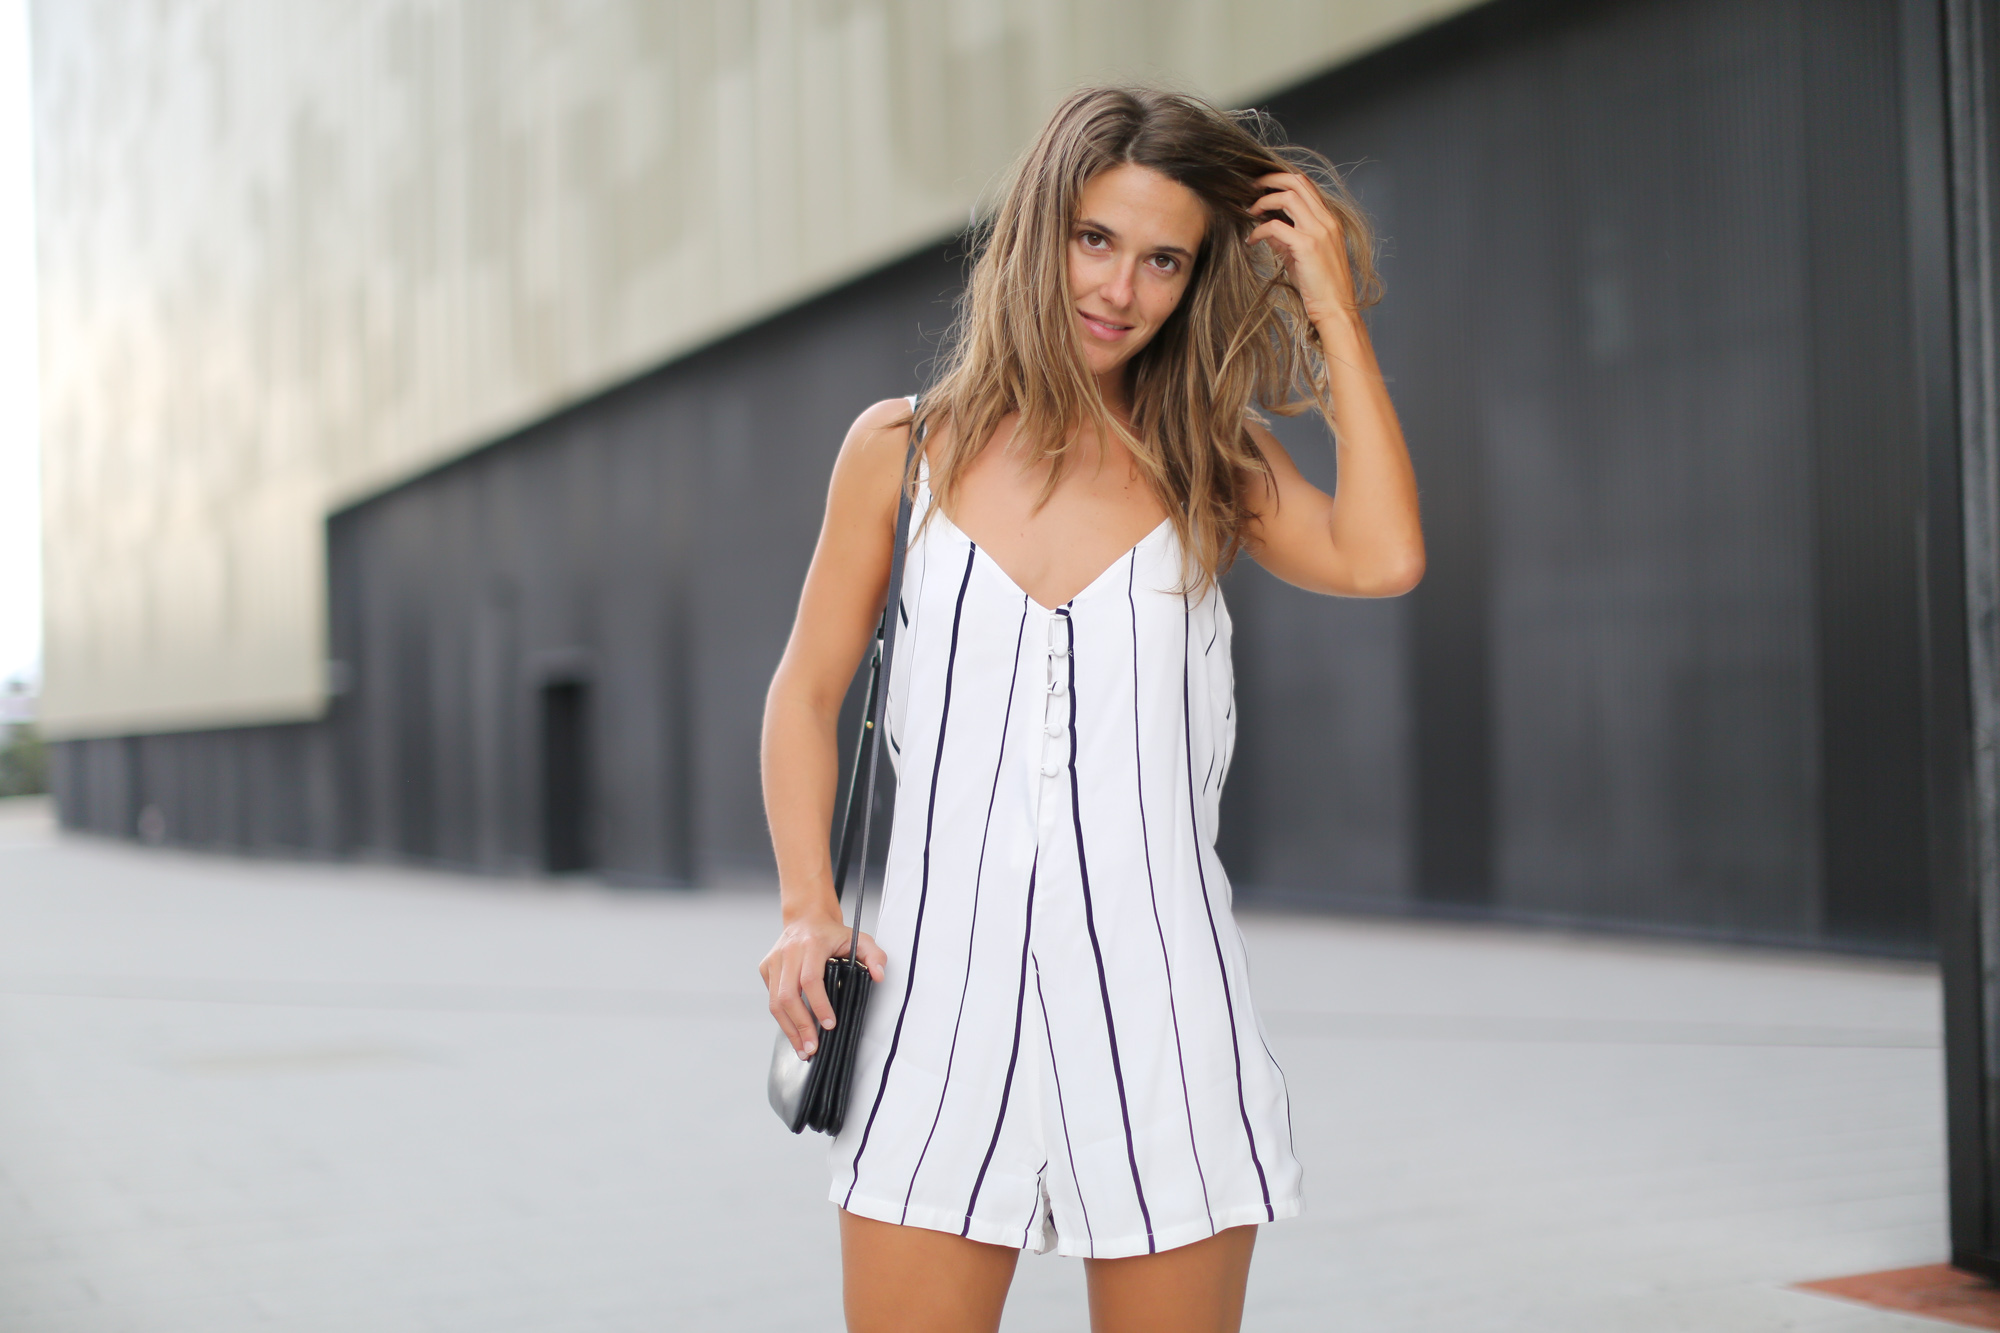 Clochet-streetstyle-faithfull-the-brand-jumpsuit-celine-trio-bag-7